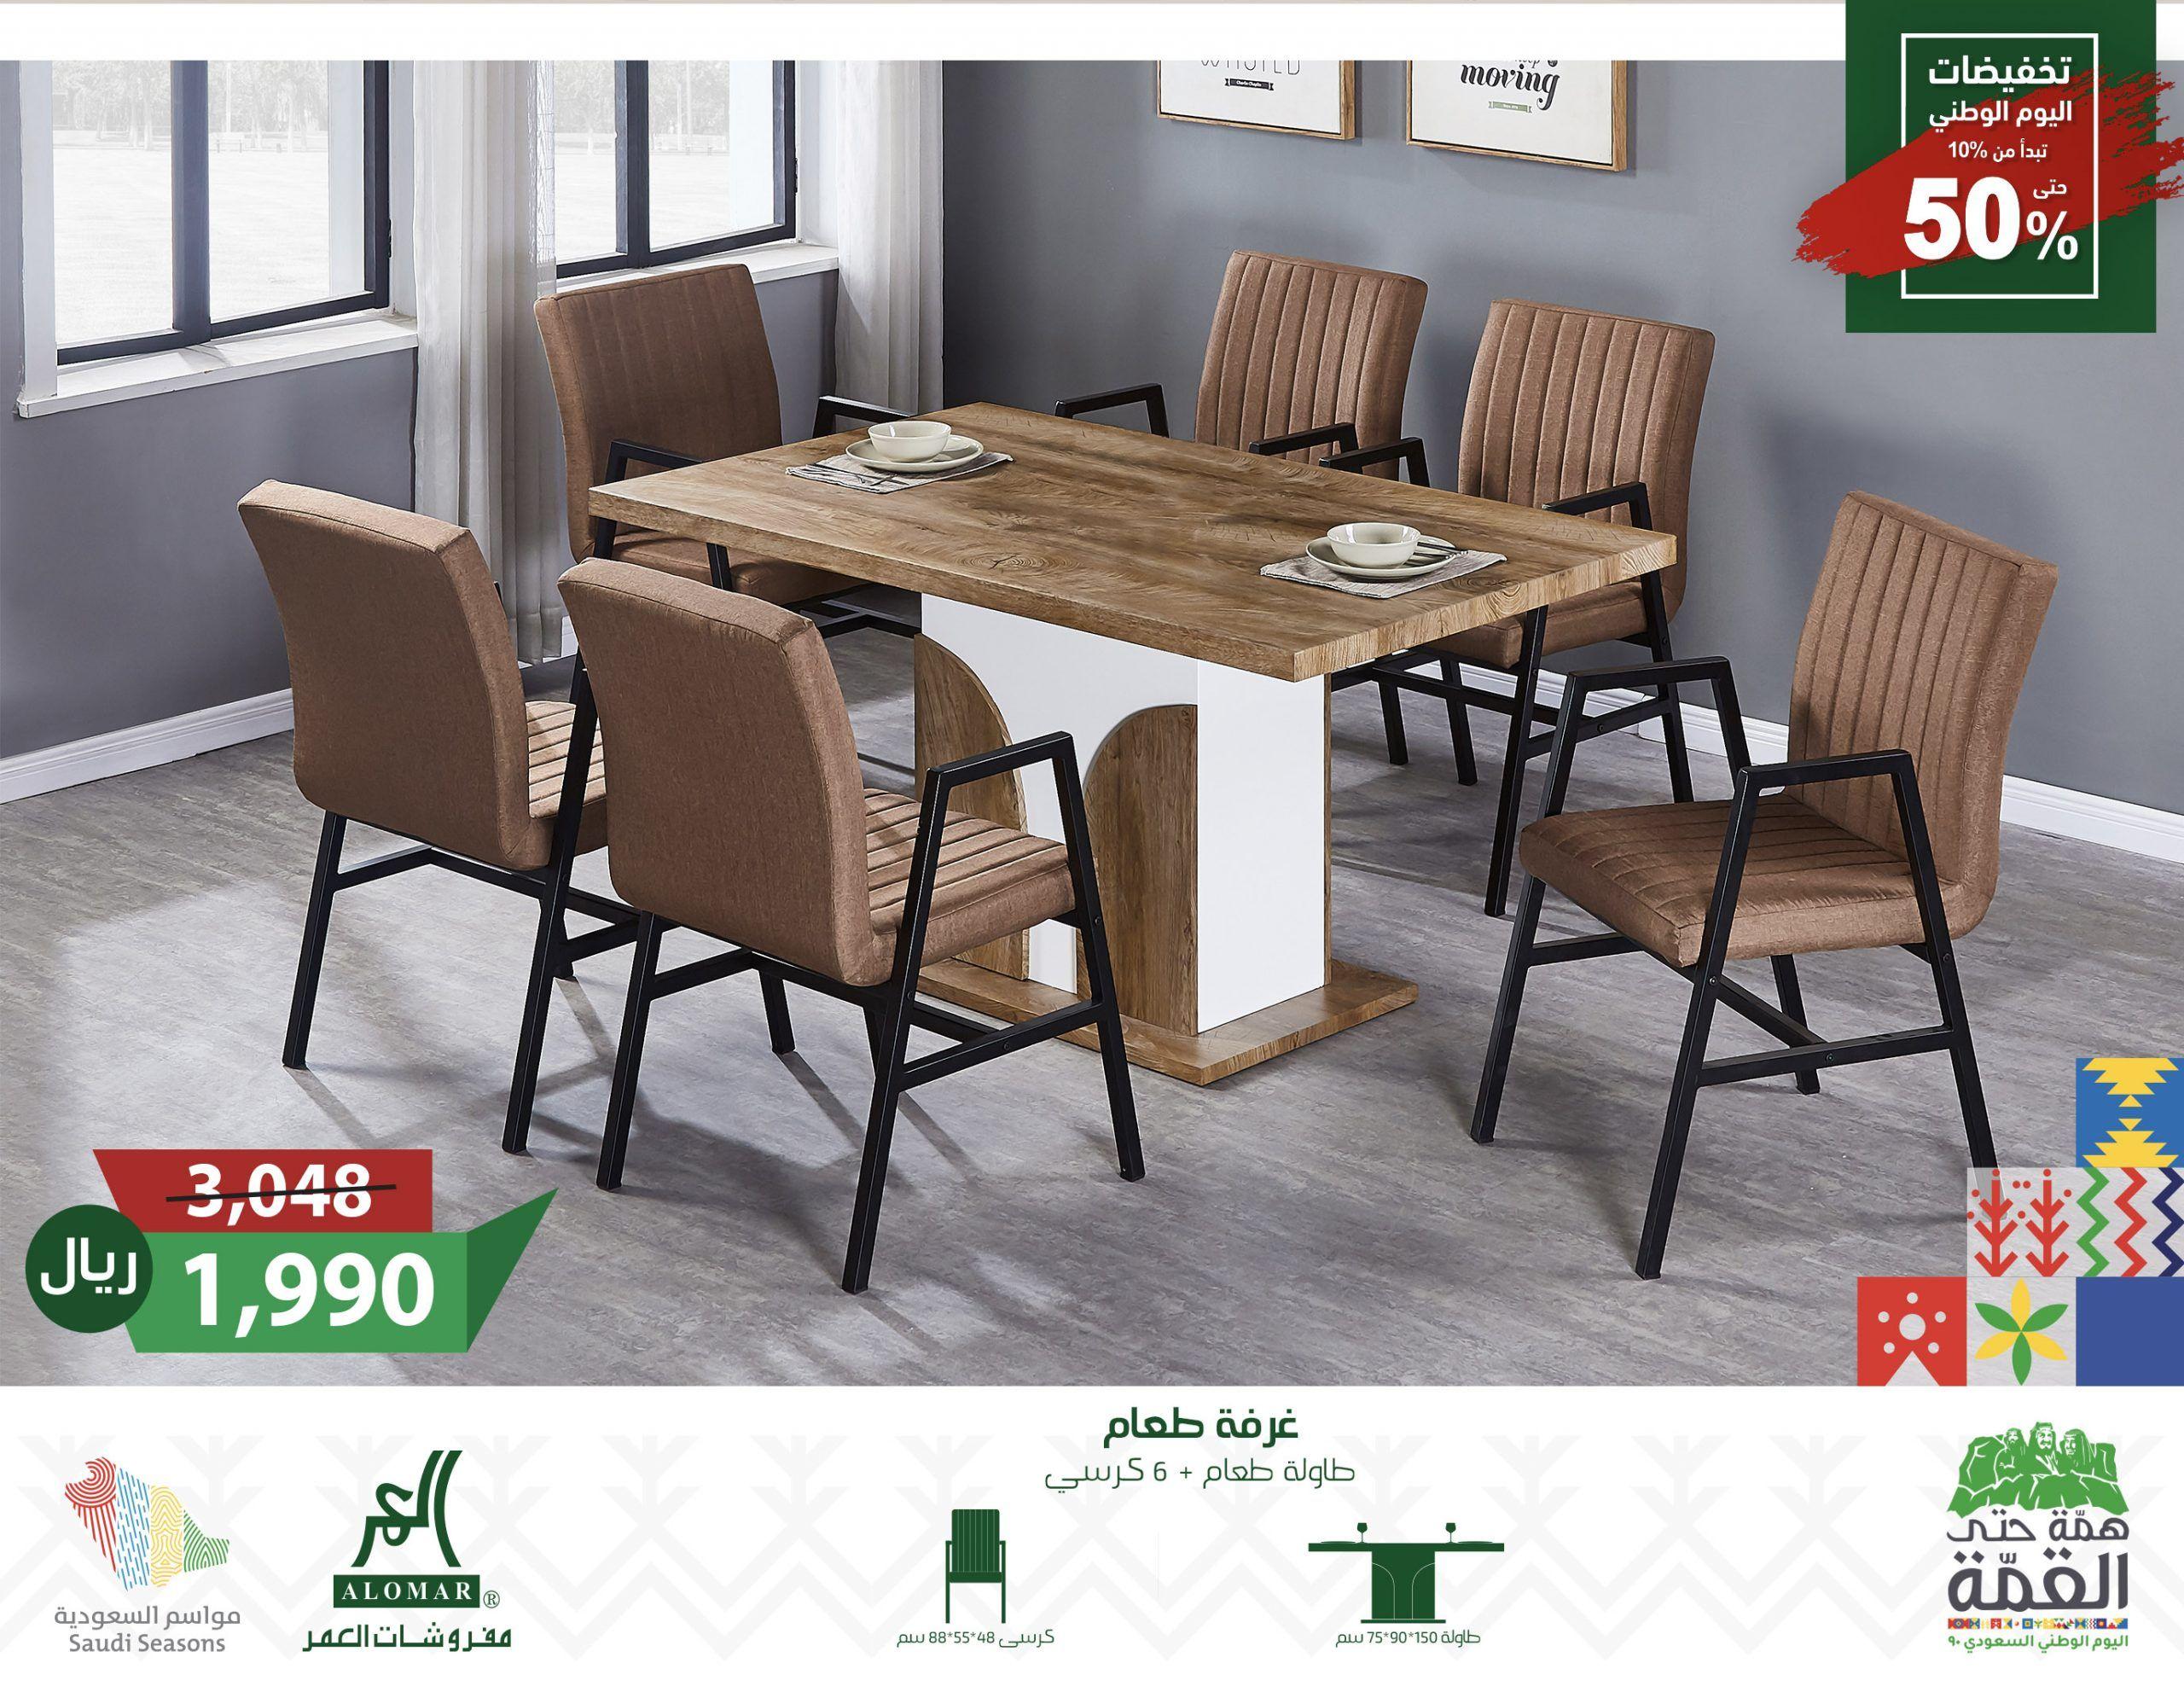 طاولة طعام ٦ كرسي رخام Home Decor Furniture Dining Chairs